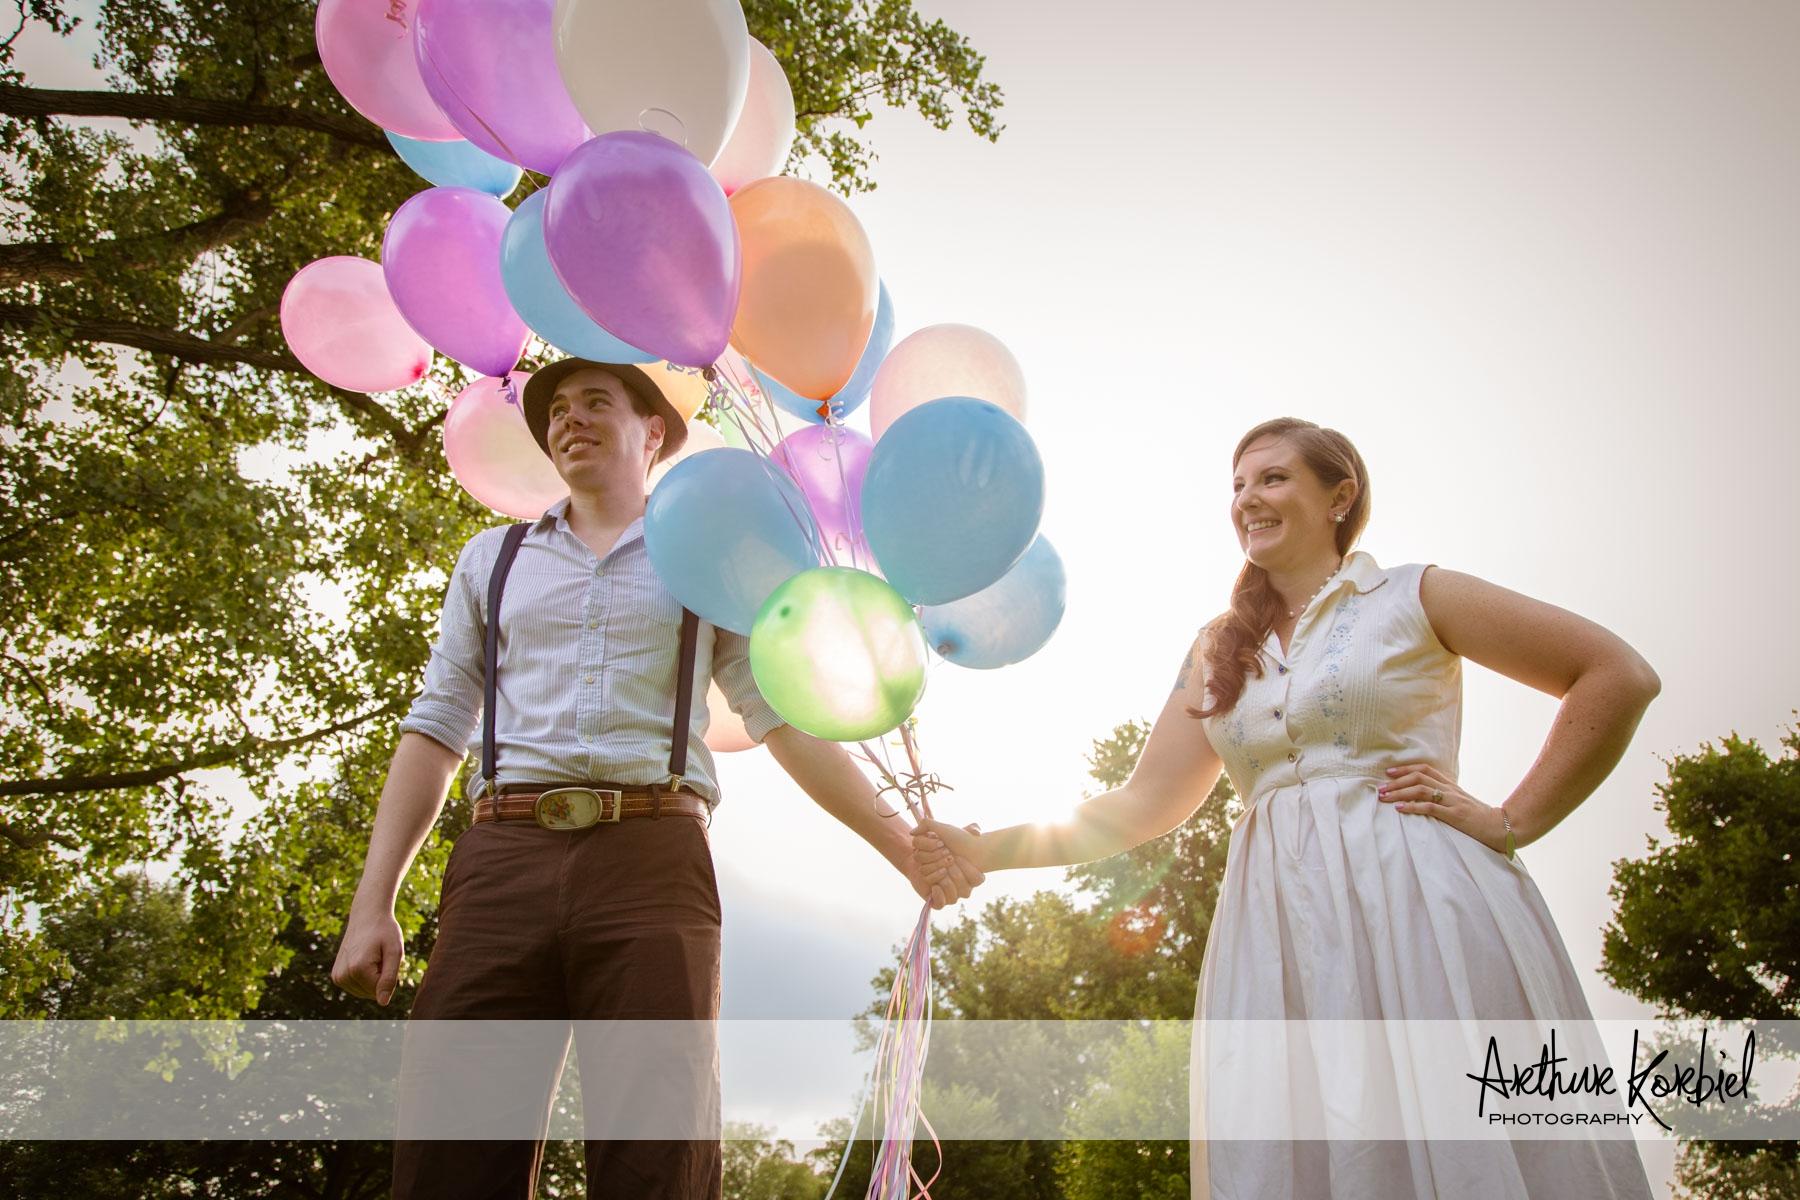 Arthur Korbiel Photography - London Engagement Photographer - Erin &Cameron-019.jpg